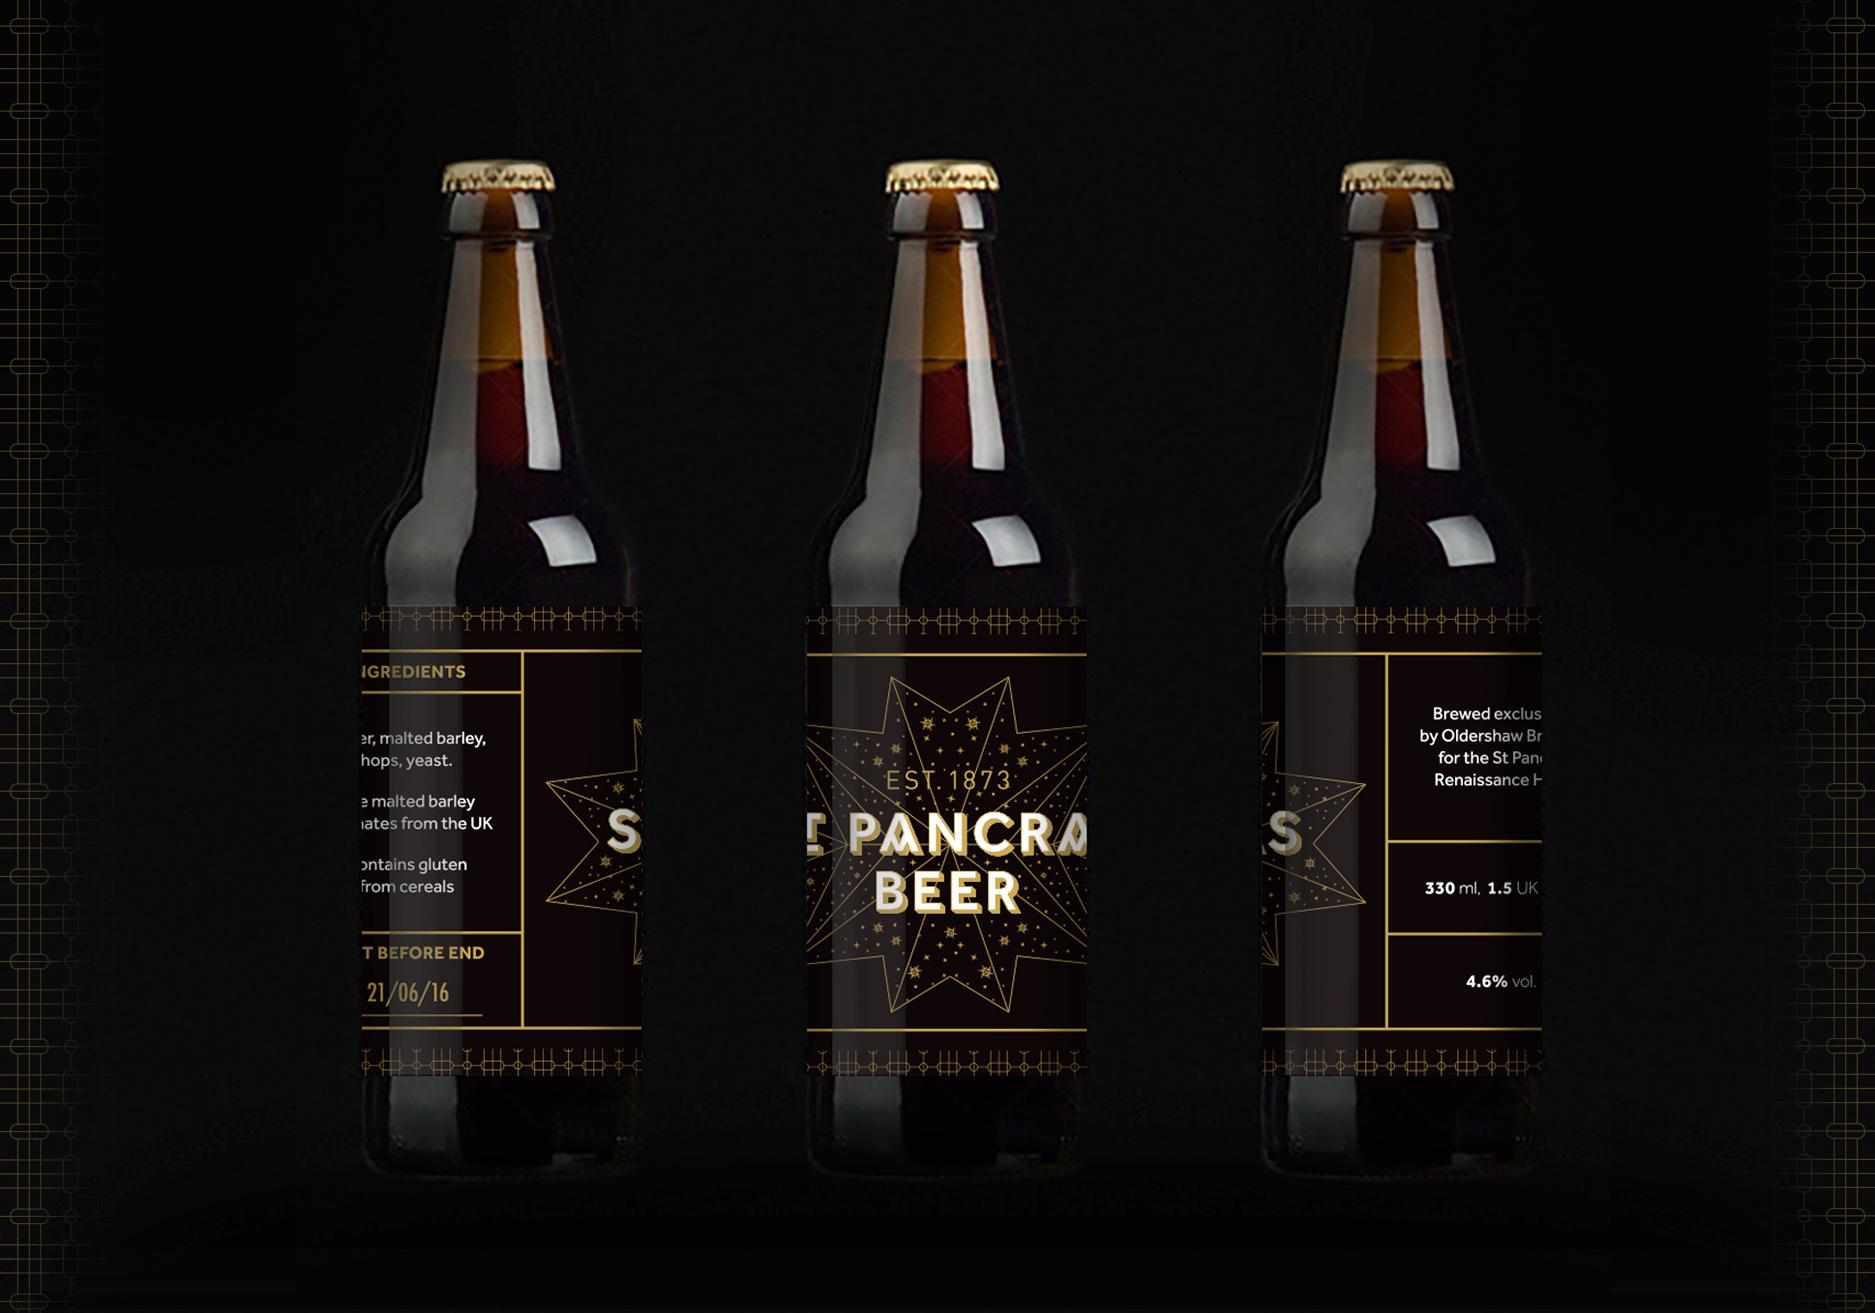 StPanc_BeerLabel_BottleMock_04